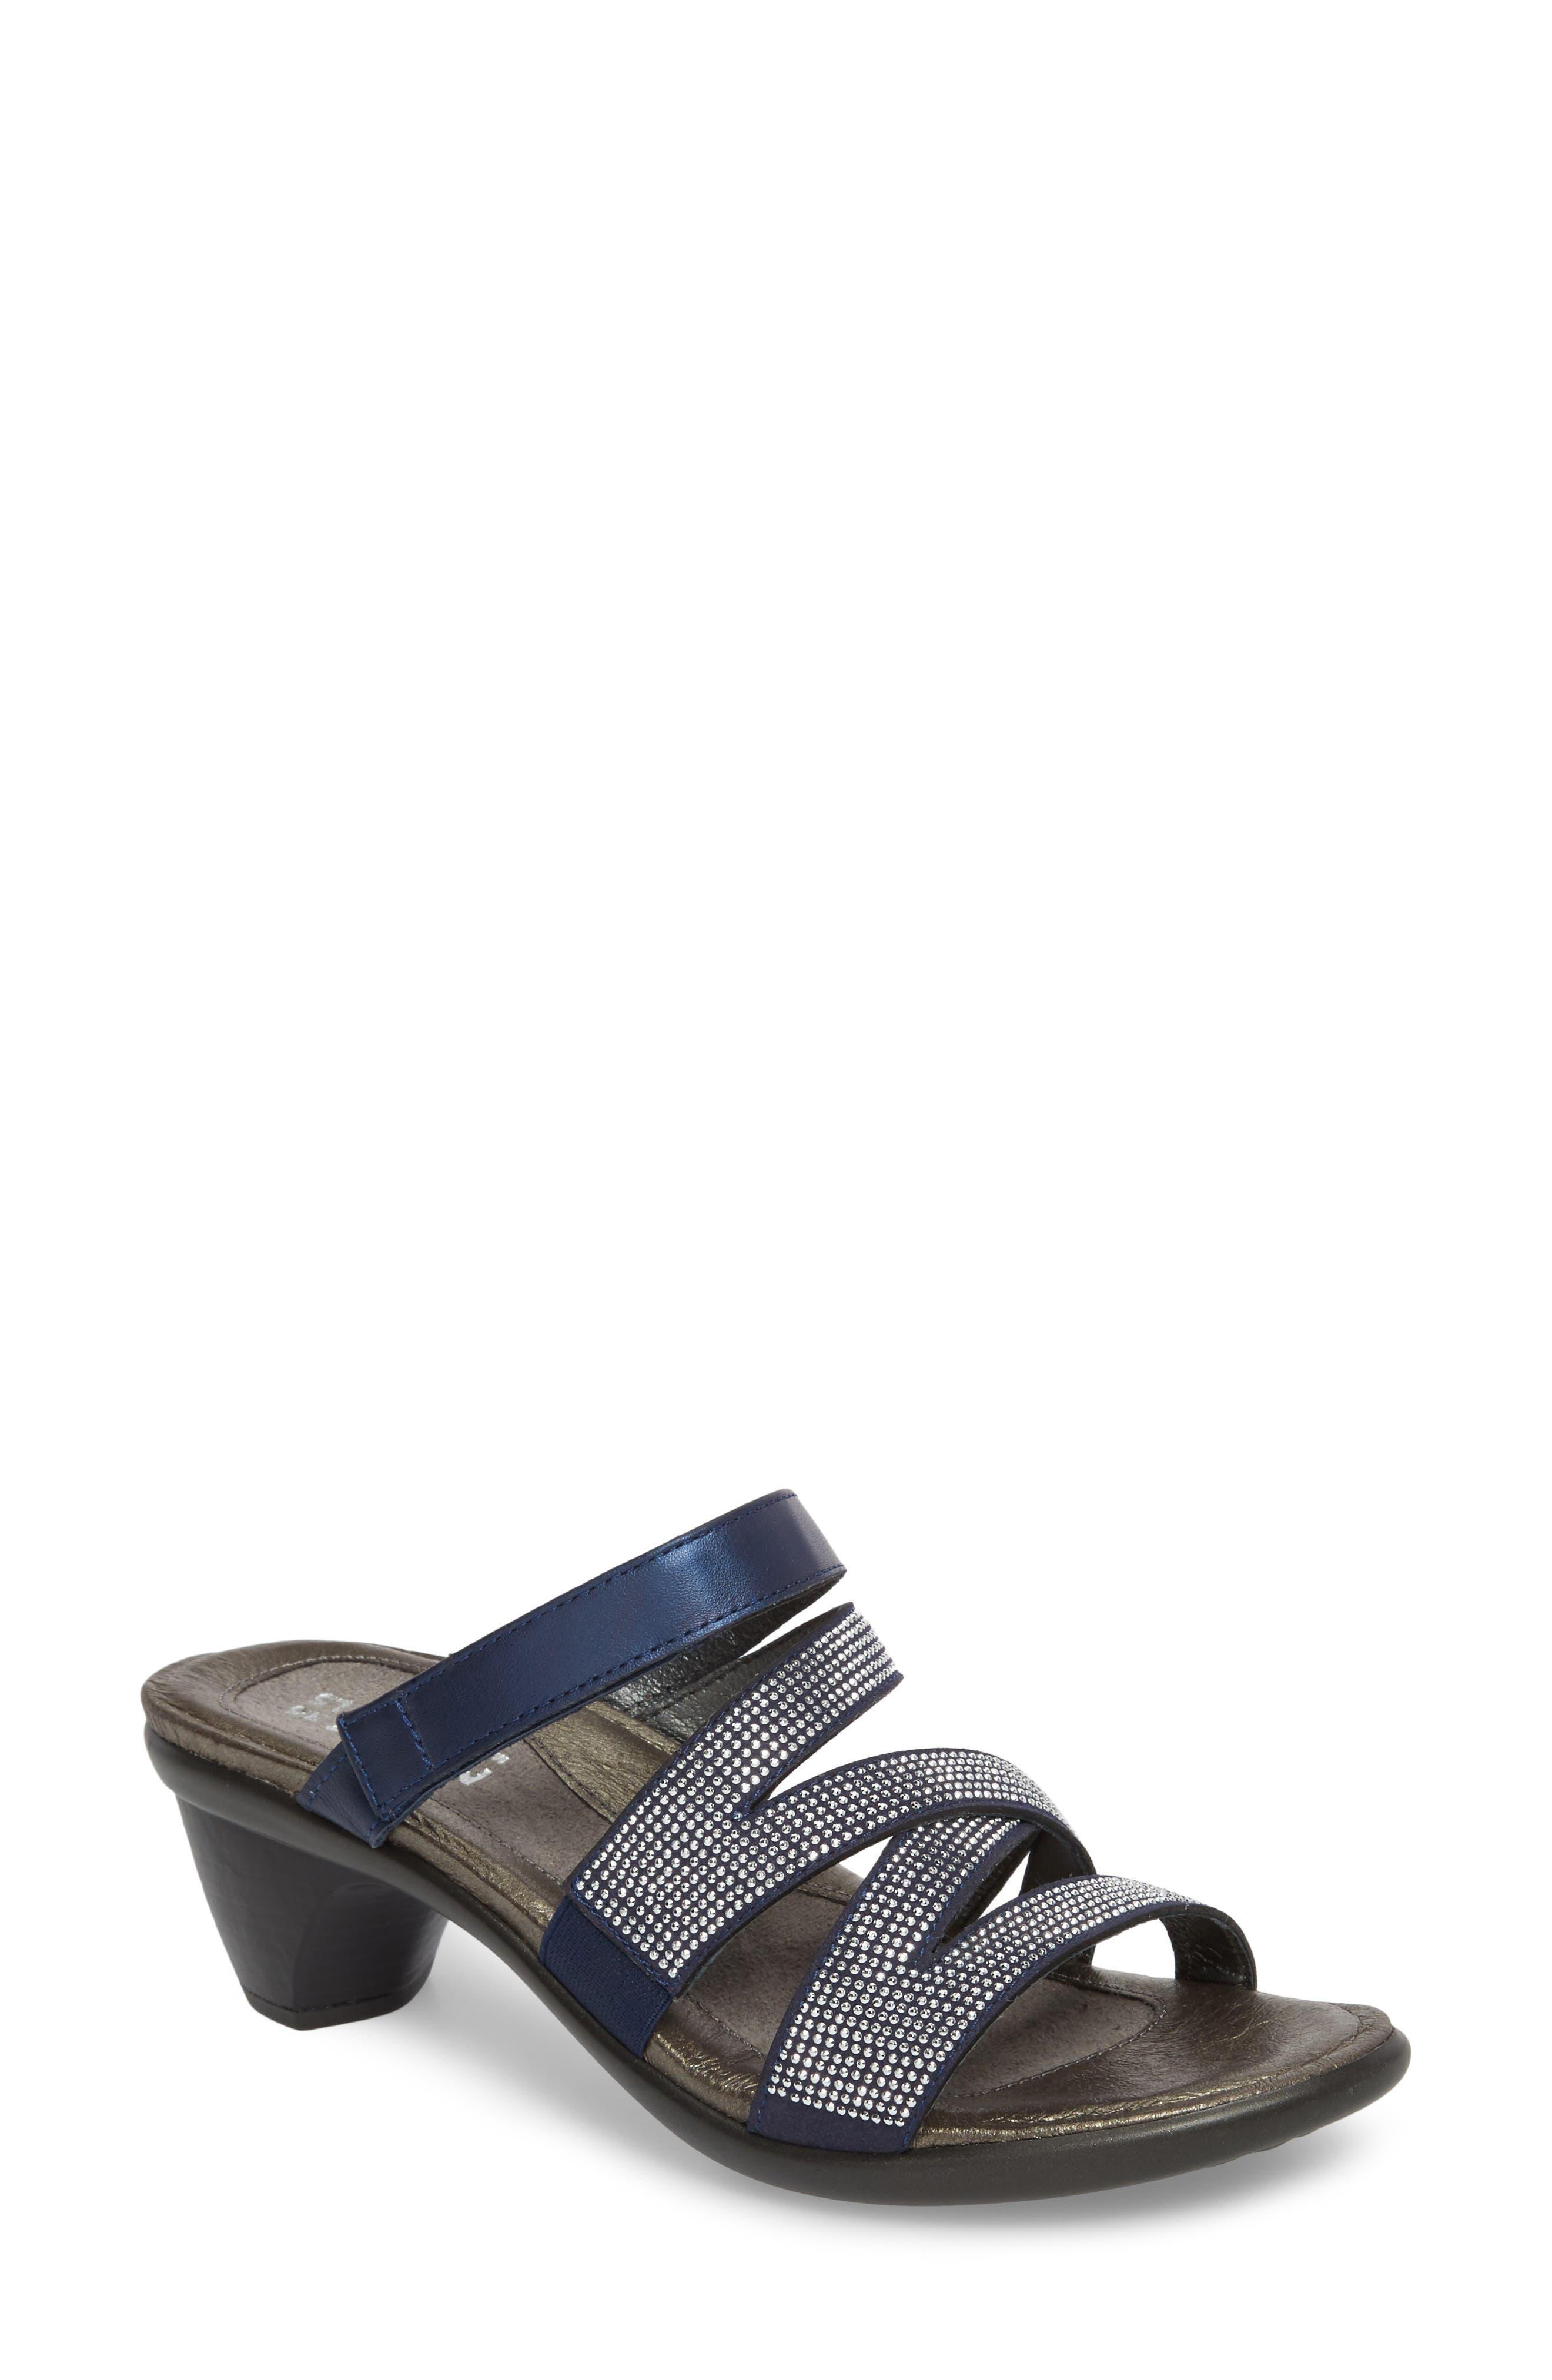 Main Image - Naot Formal Sandal (Women)